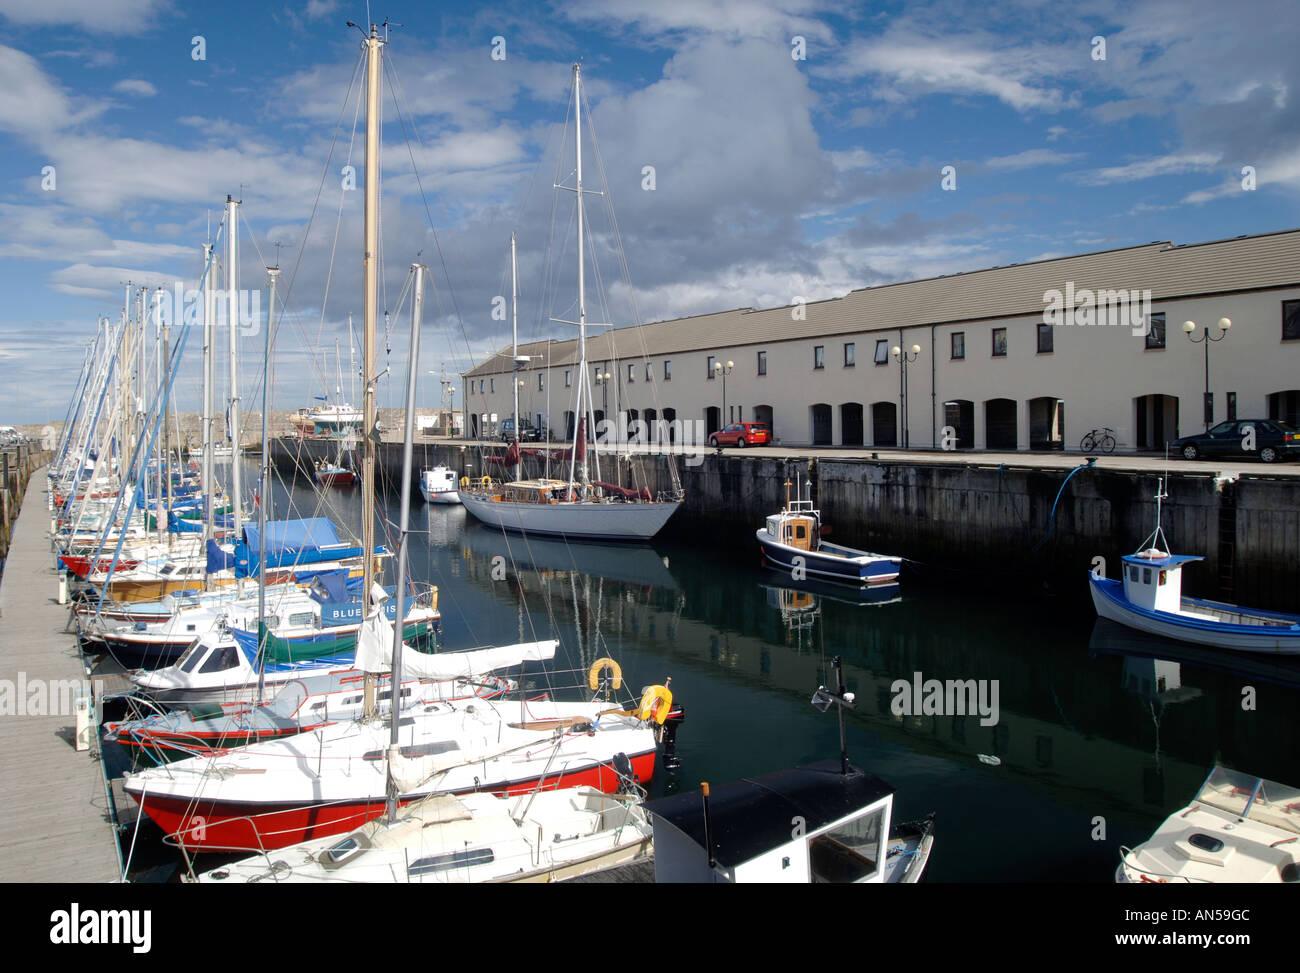 Lossiemouth marina for leisure boats, Morayshire. Scotland.  XPL 3224-321 - Stock Image